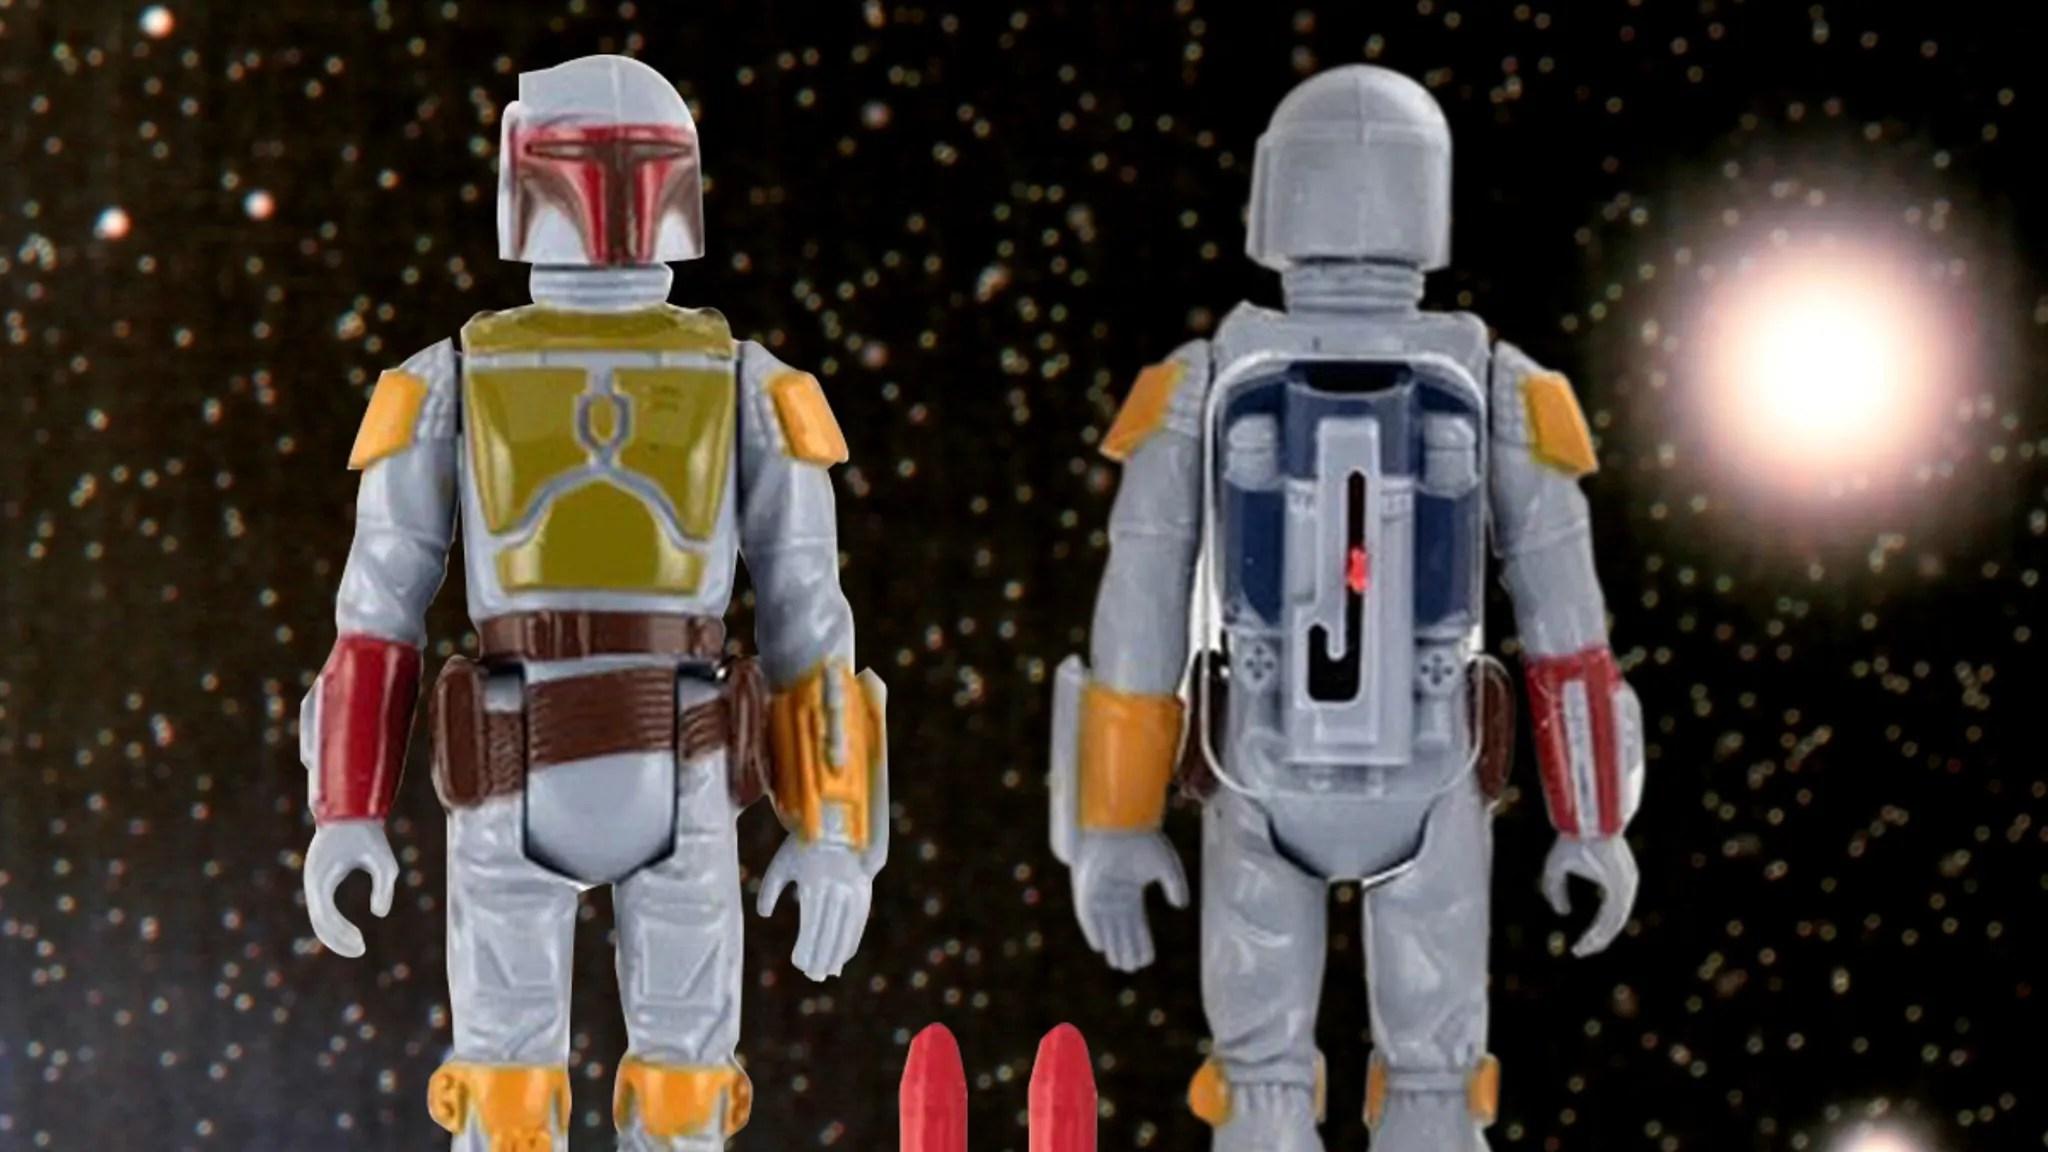 Rarest Star Wars Toy Ever Hits Auction Block Missile Firing Boba Fett